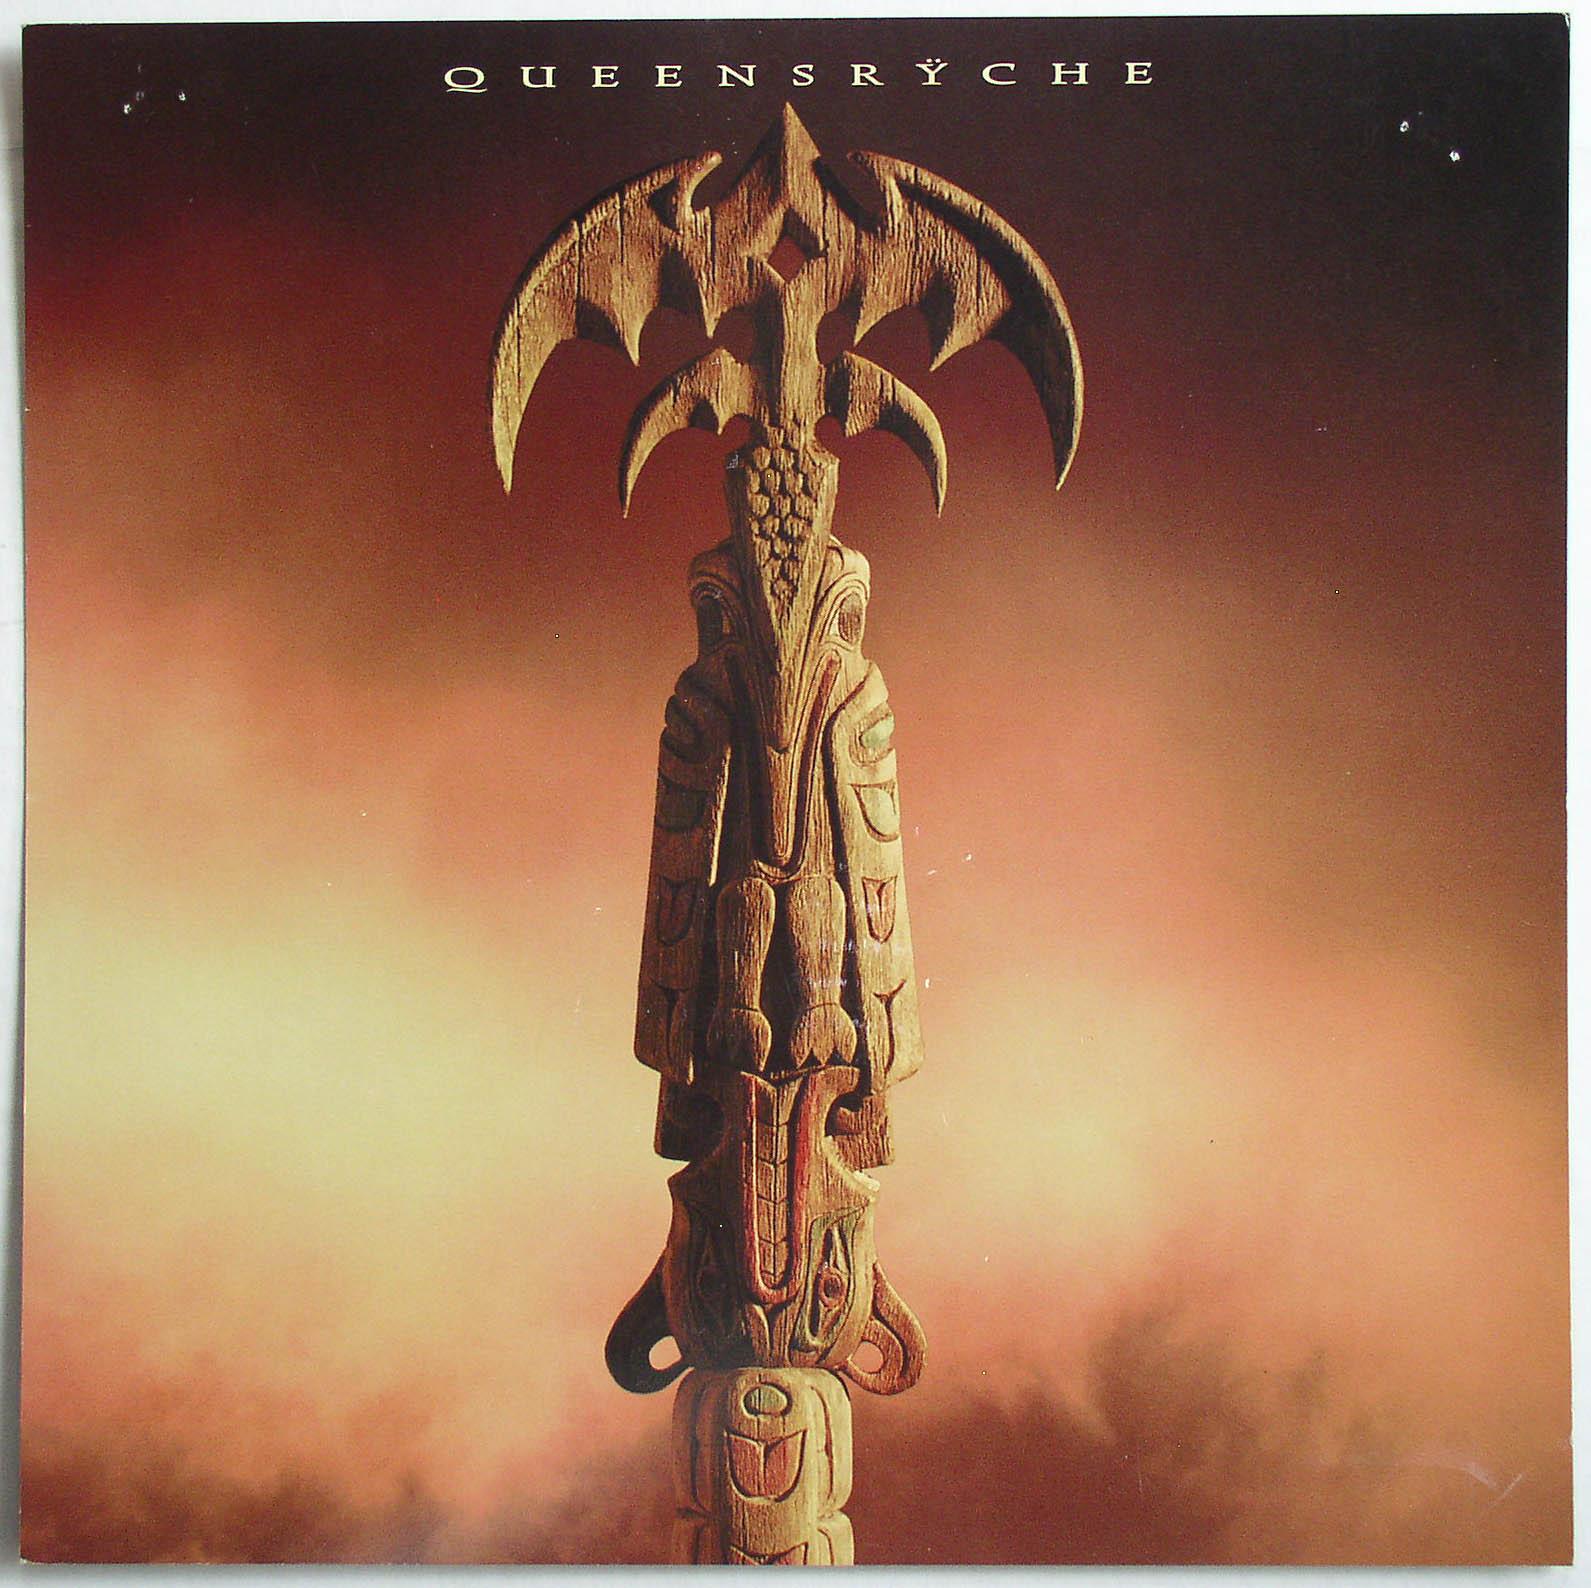 Queensrÿche  Promised Land